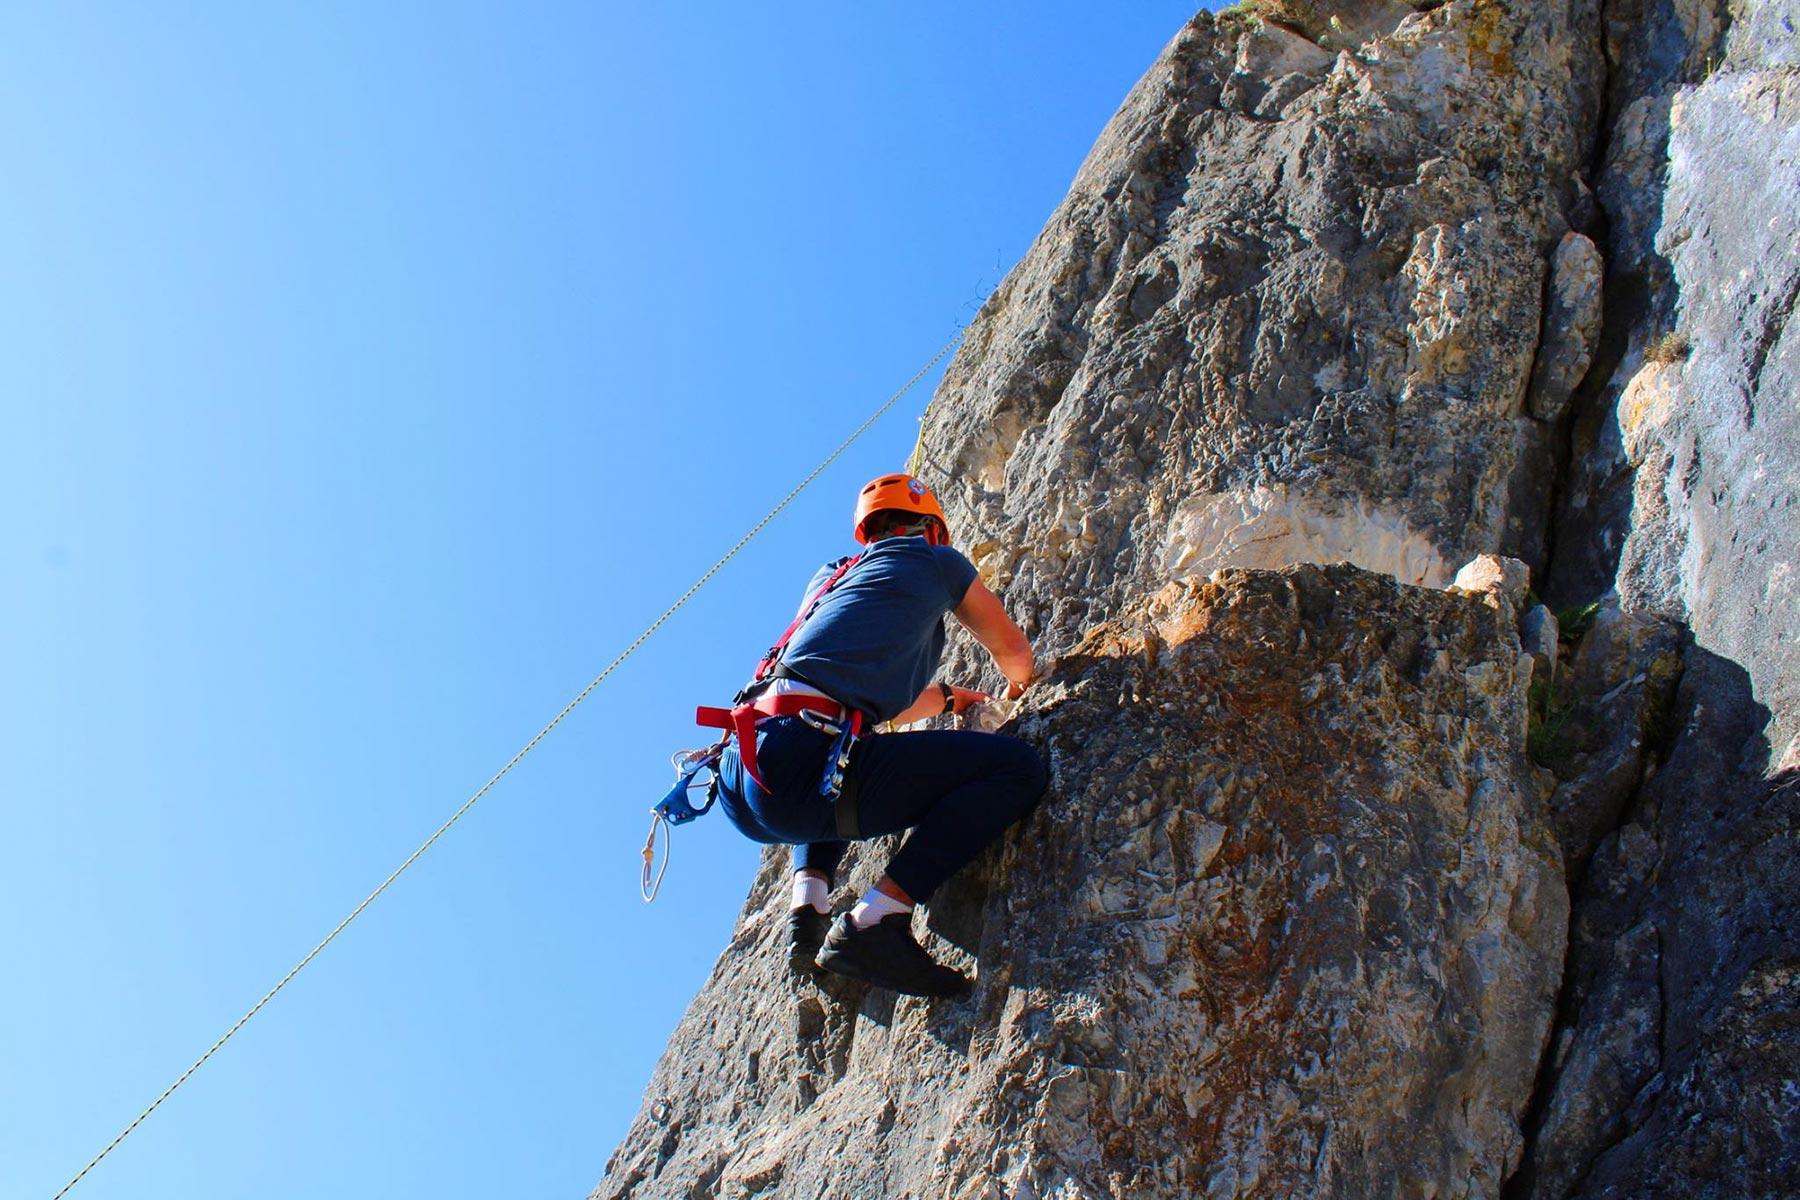 ozren free climbing